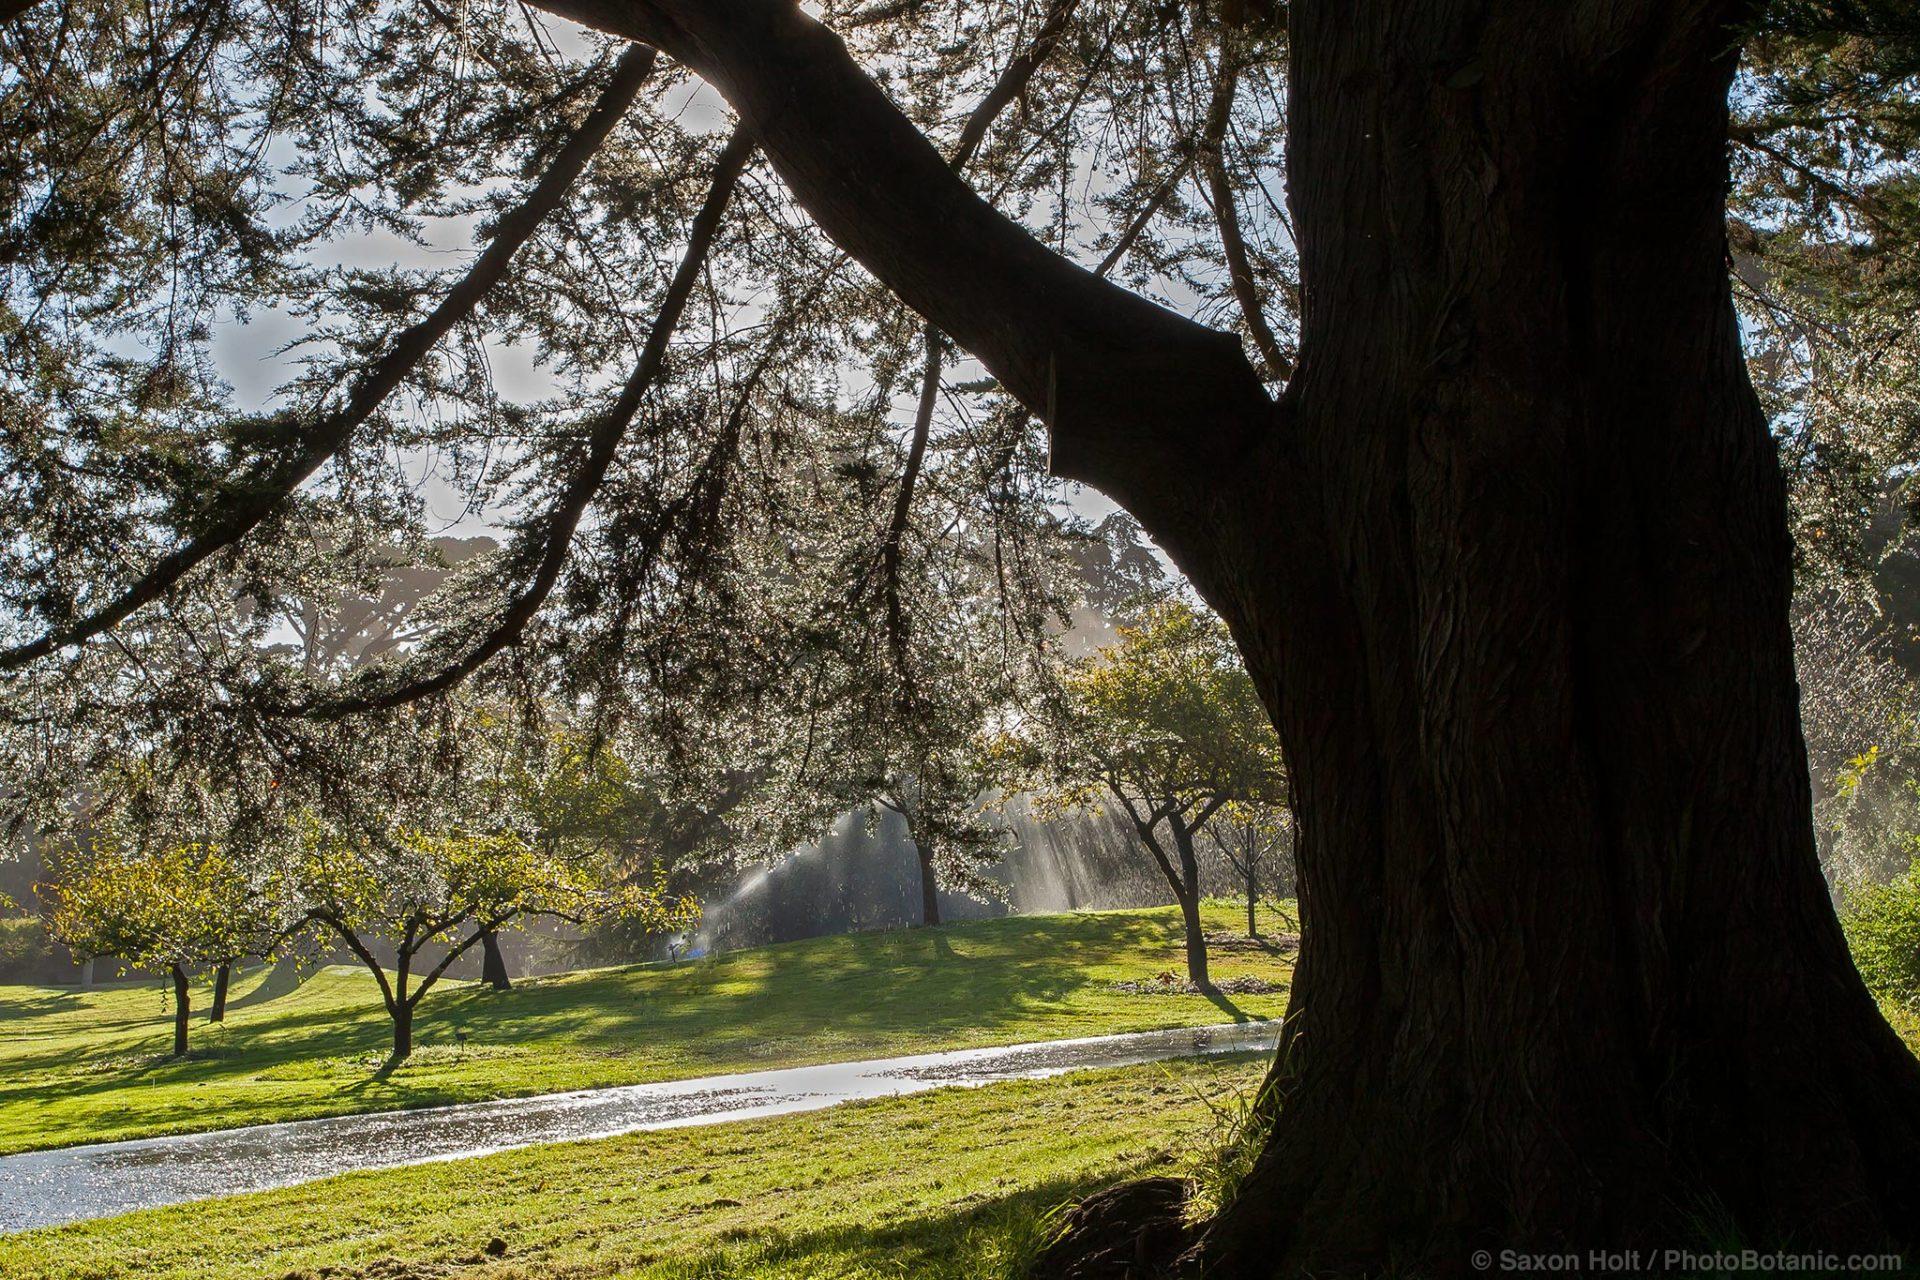 morning sprinklers in San Francisco Botanical Garden